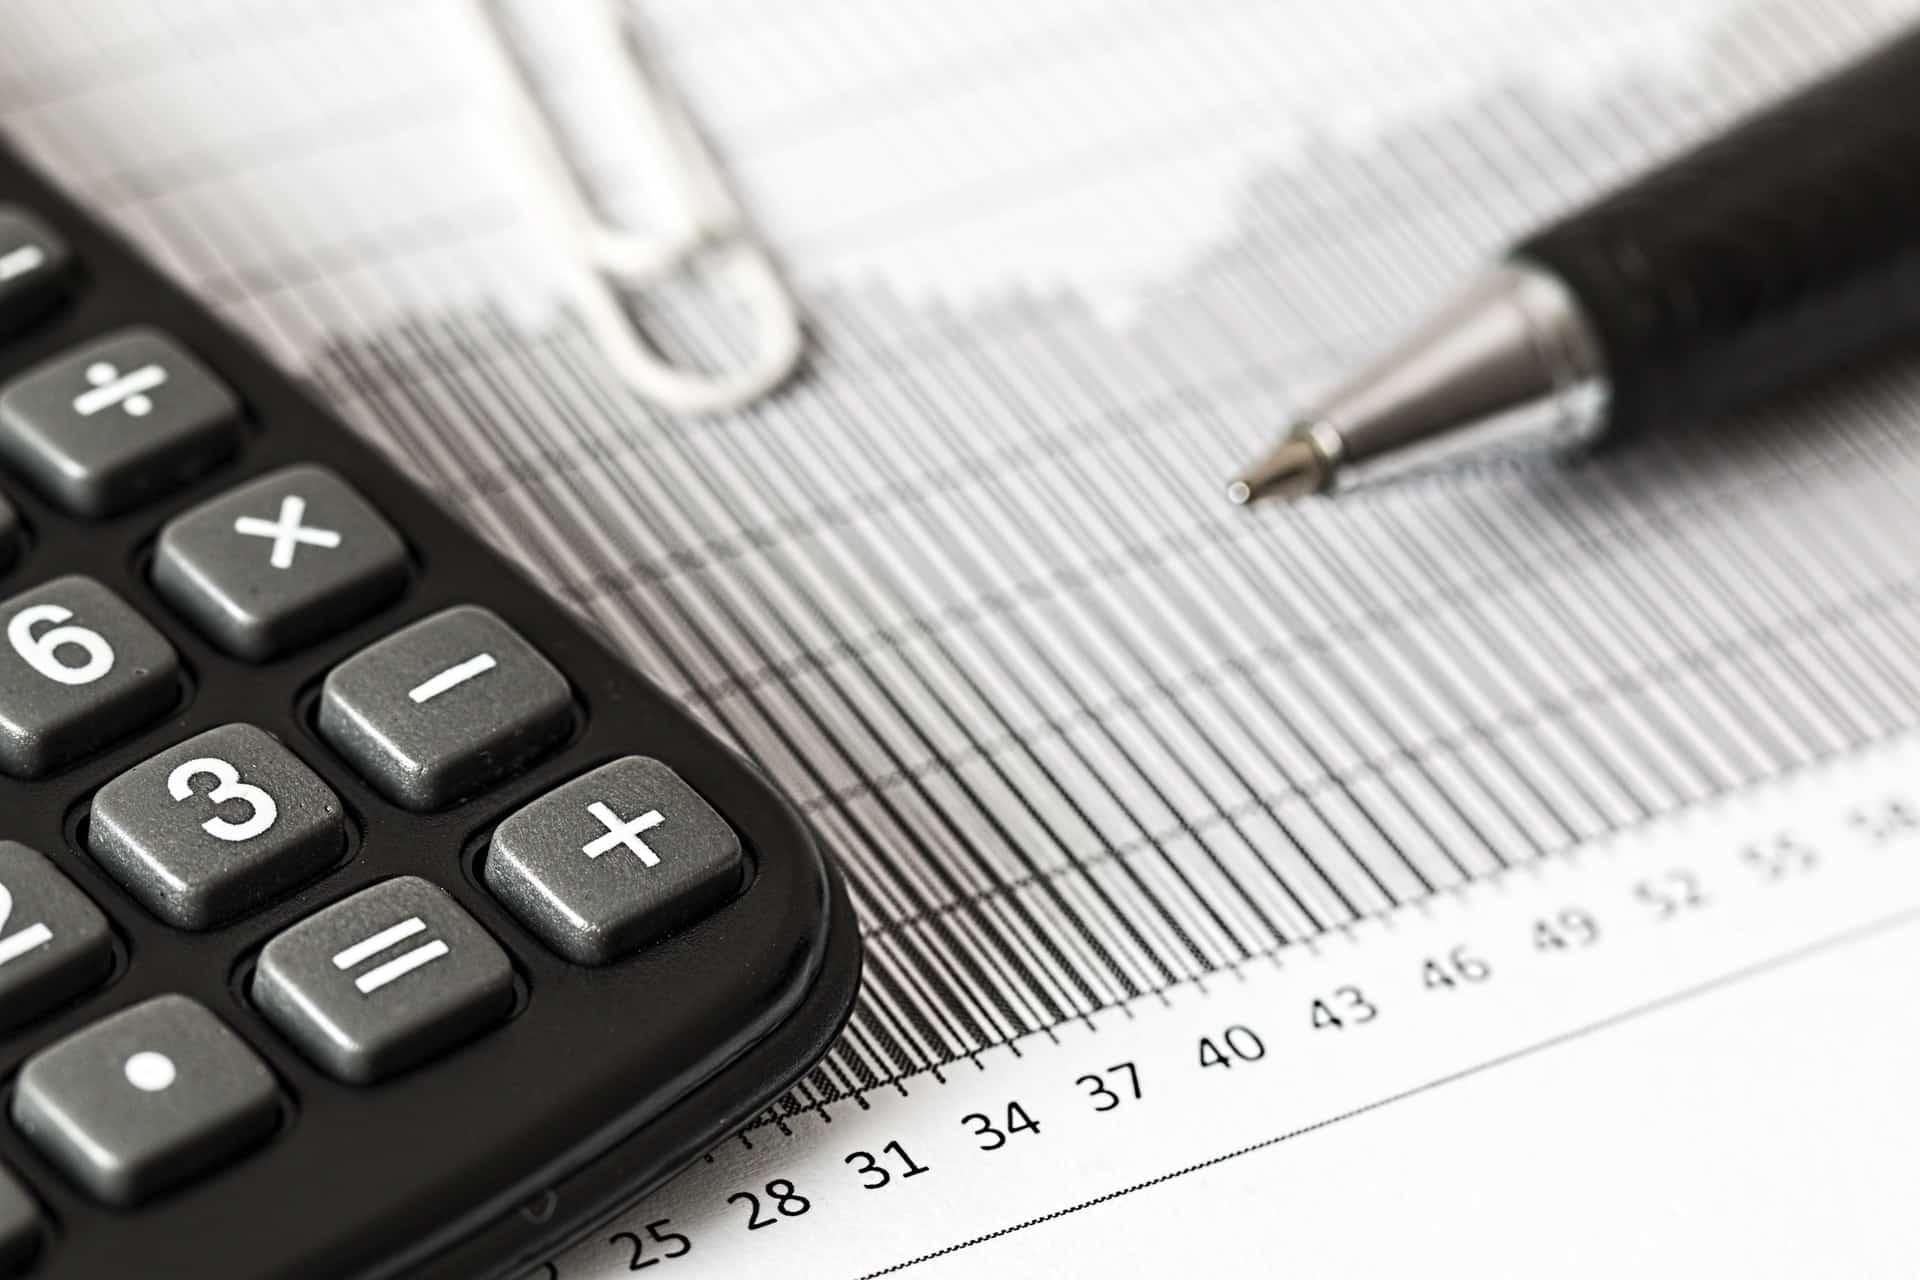 atlascomp accounting analytics balance 209224